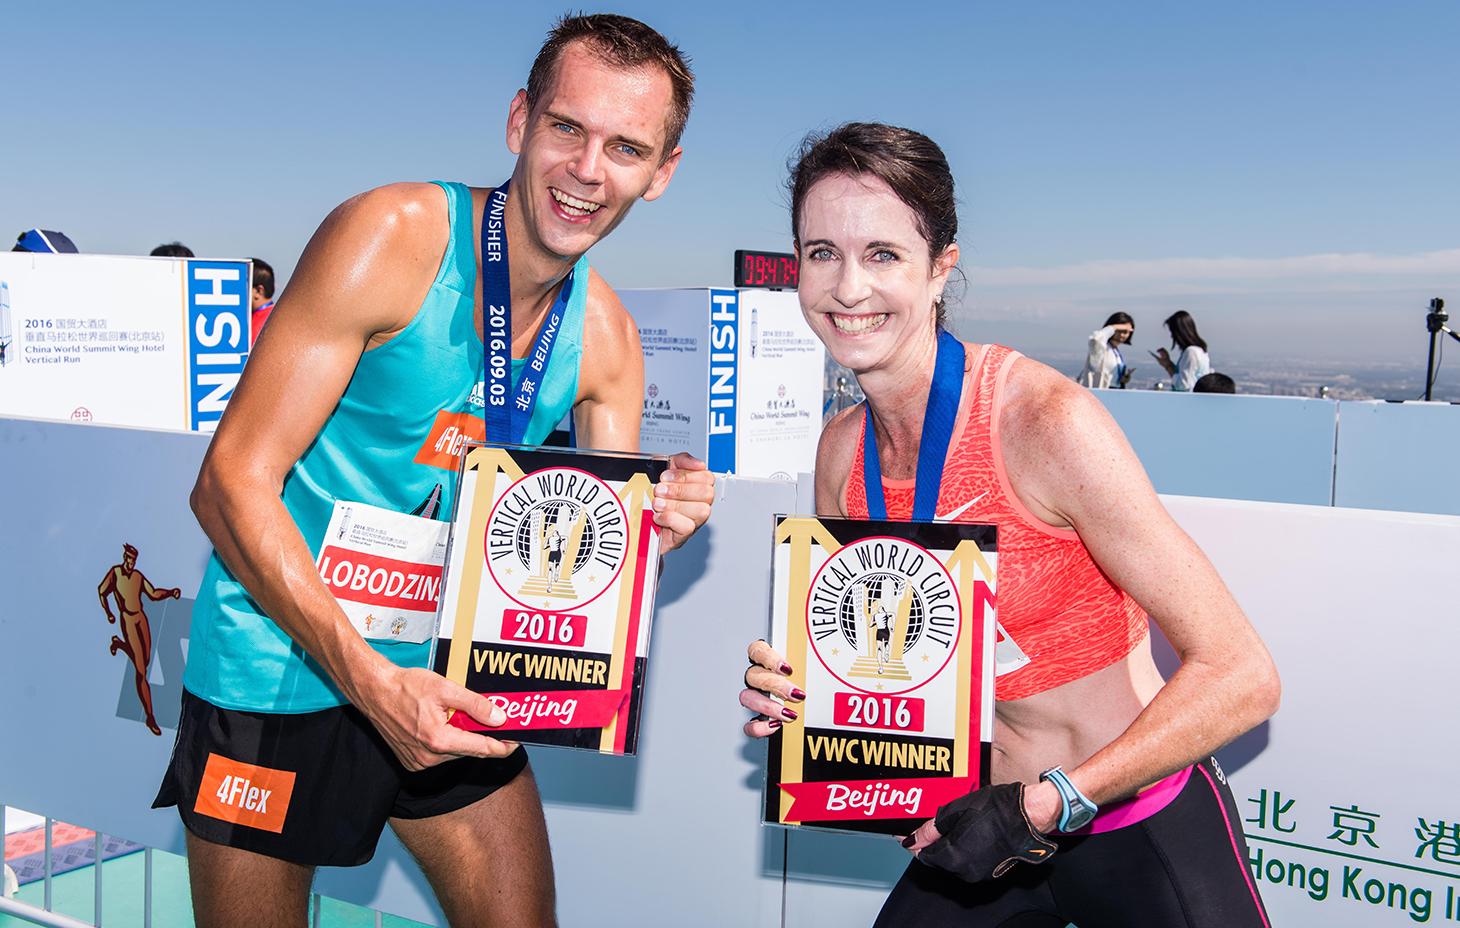 Winners Piotr Lobodzinski and Suzy Walsham. China World Summit Wing Hotel Vertical Run. ©Sporting Republic